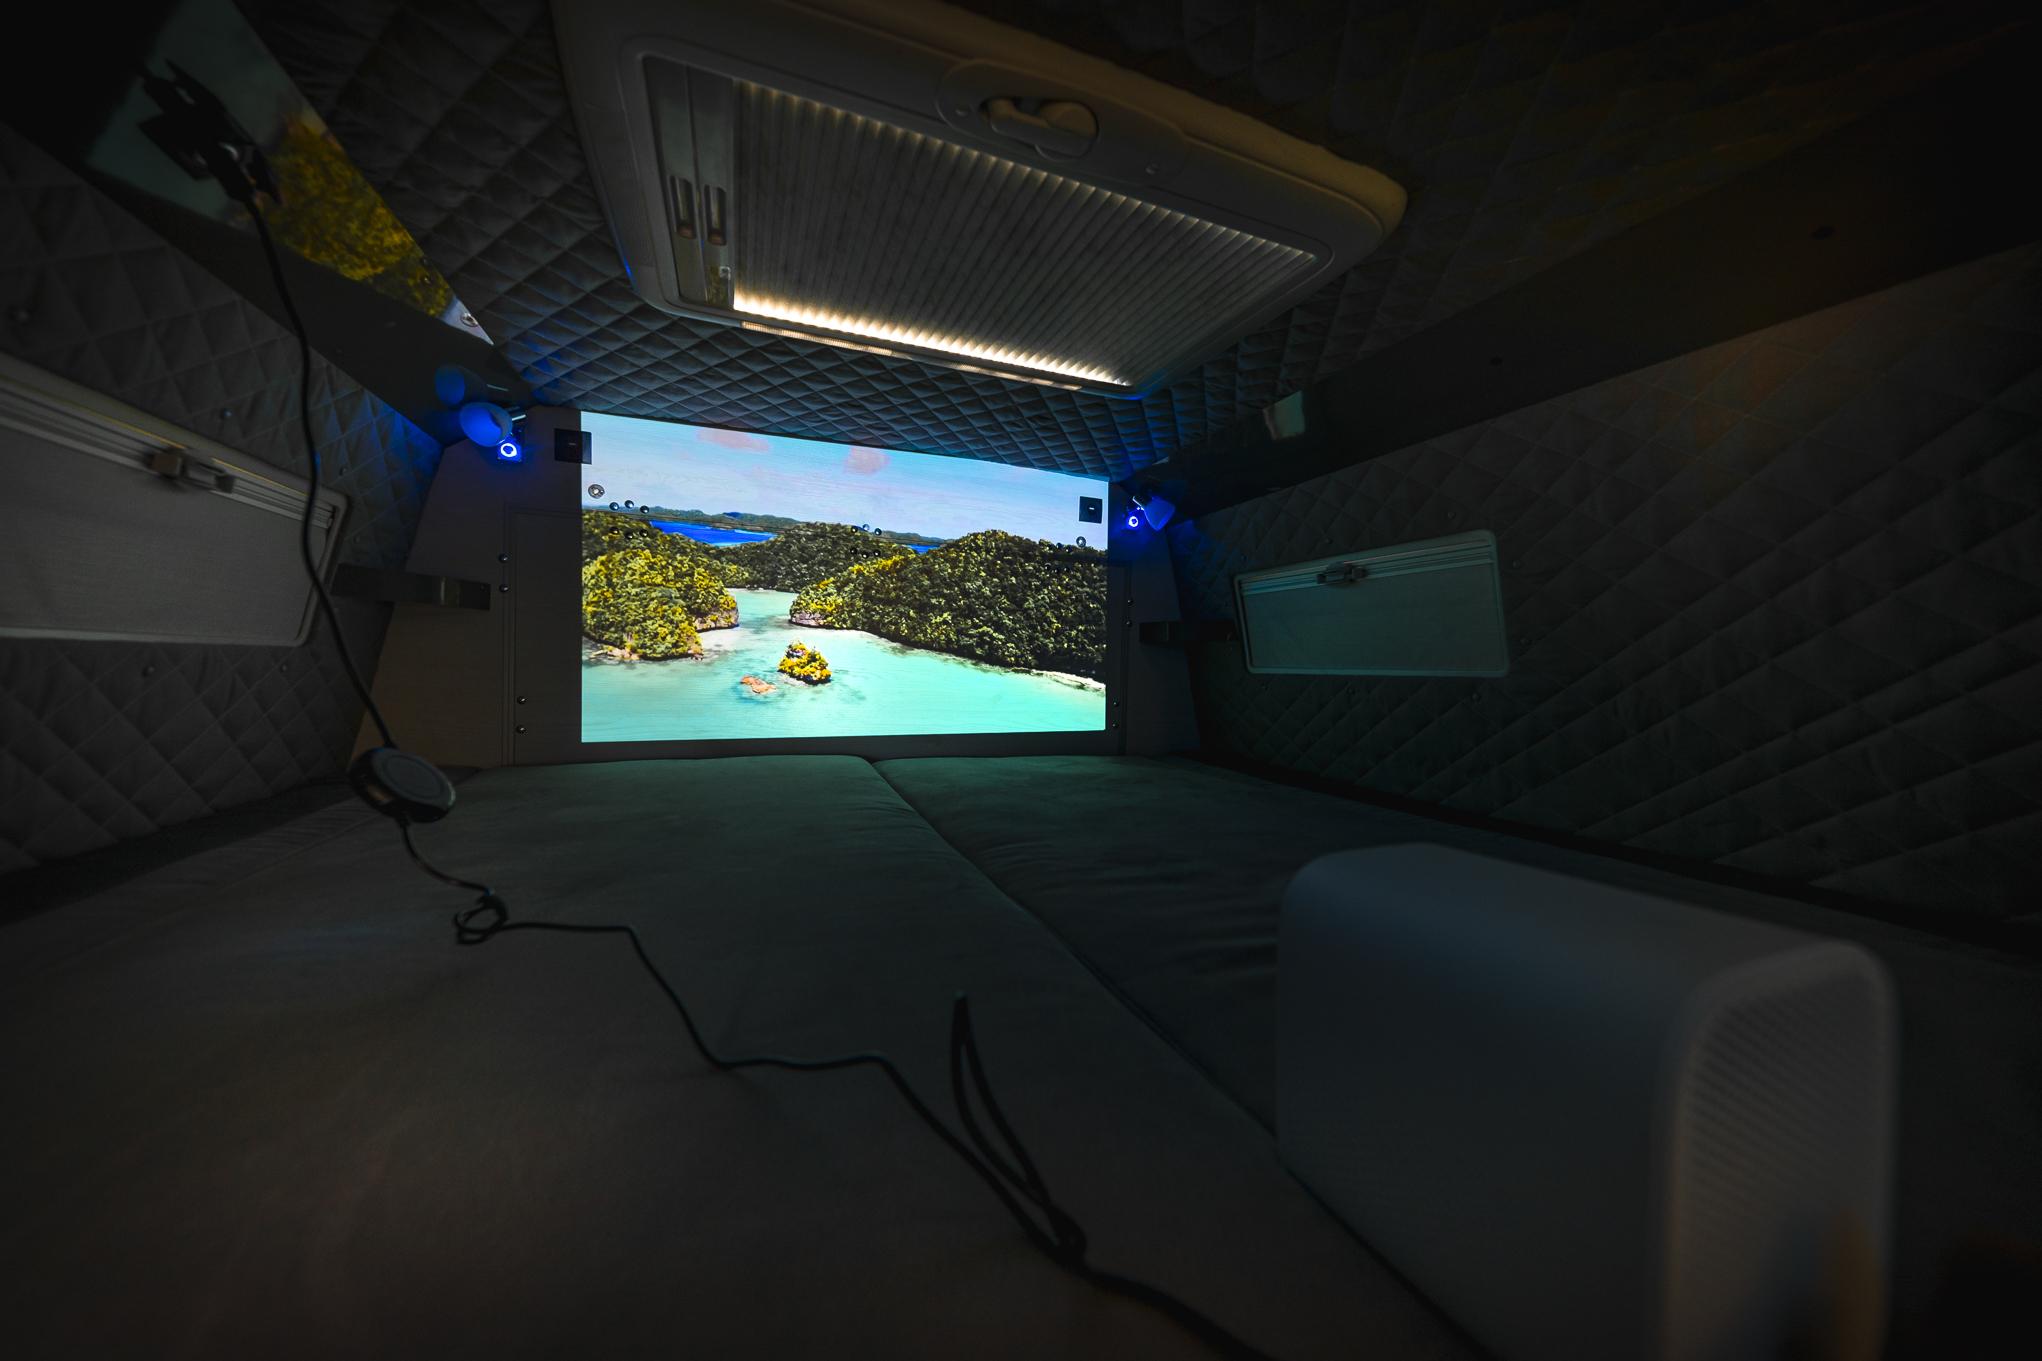 projector projektor im wohnmobil camper luxus vr landyacht offroadyacht